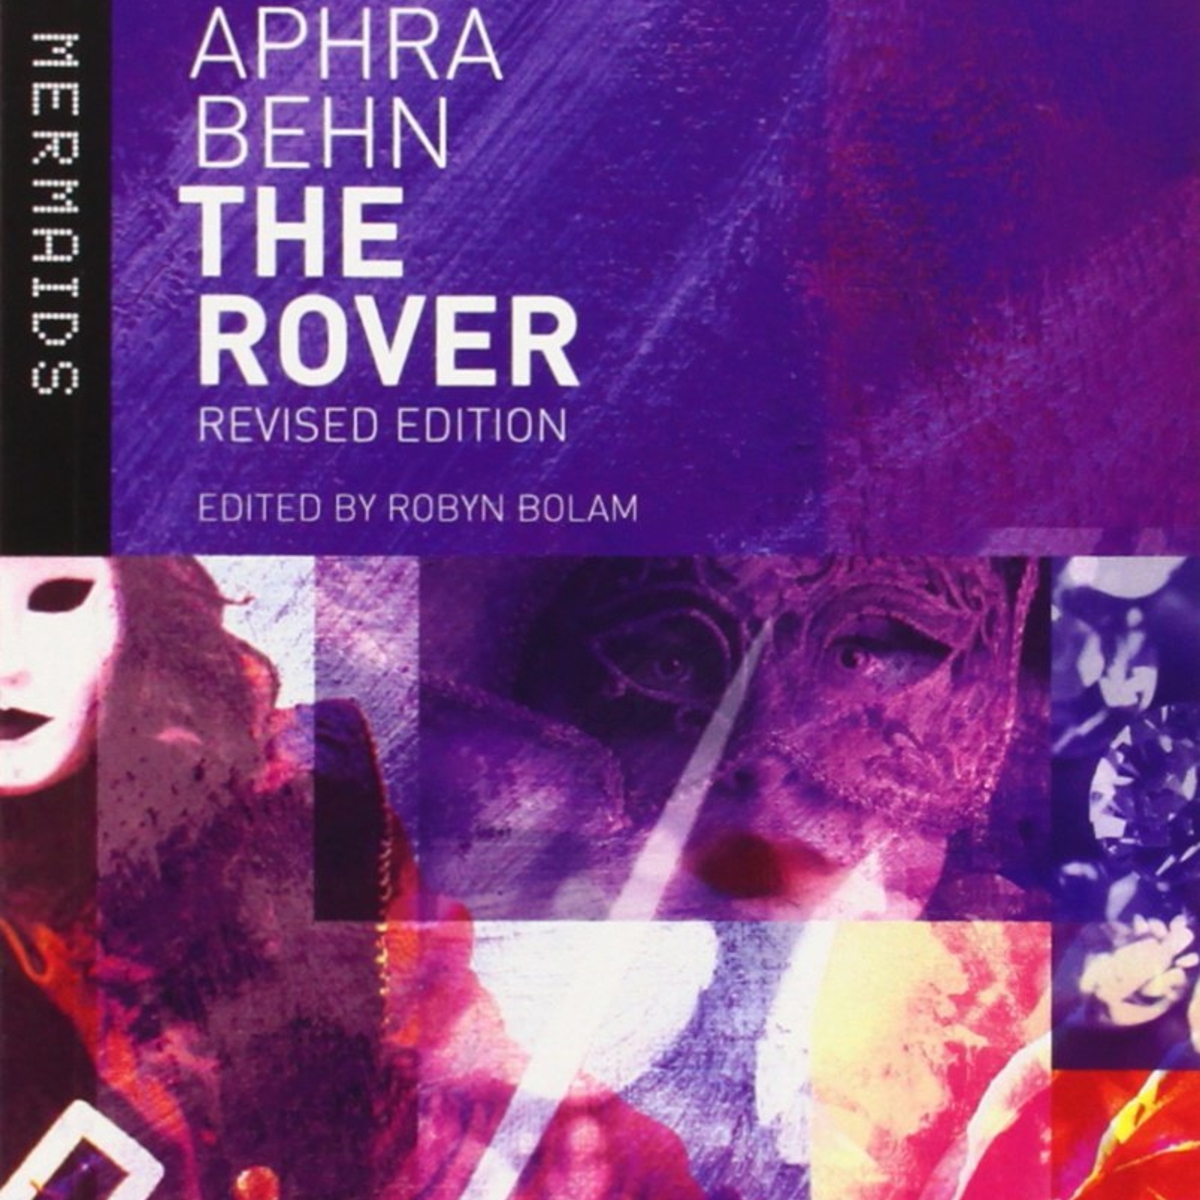 Aphra behn s the rover evaluating women s